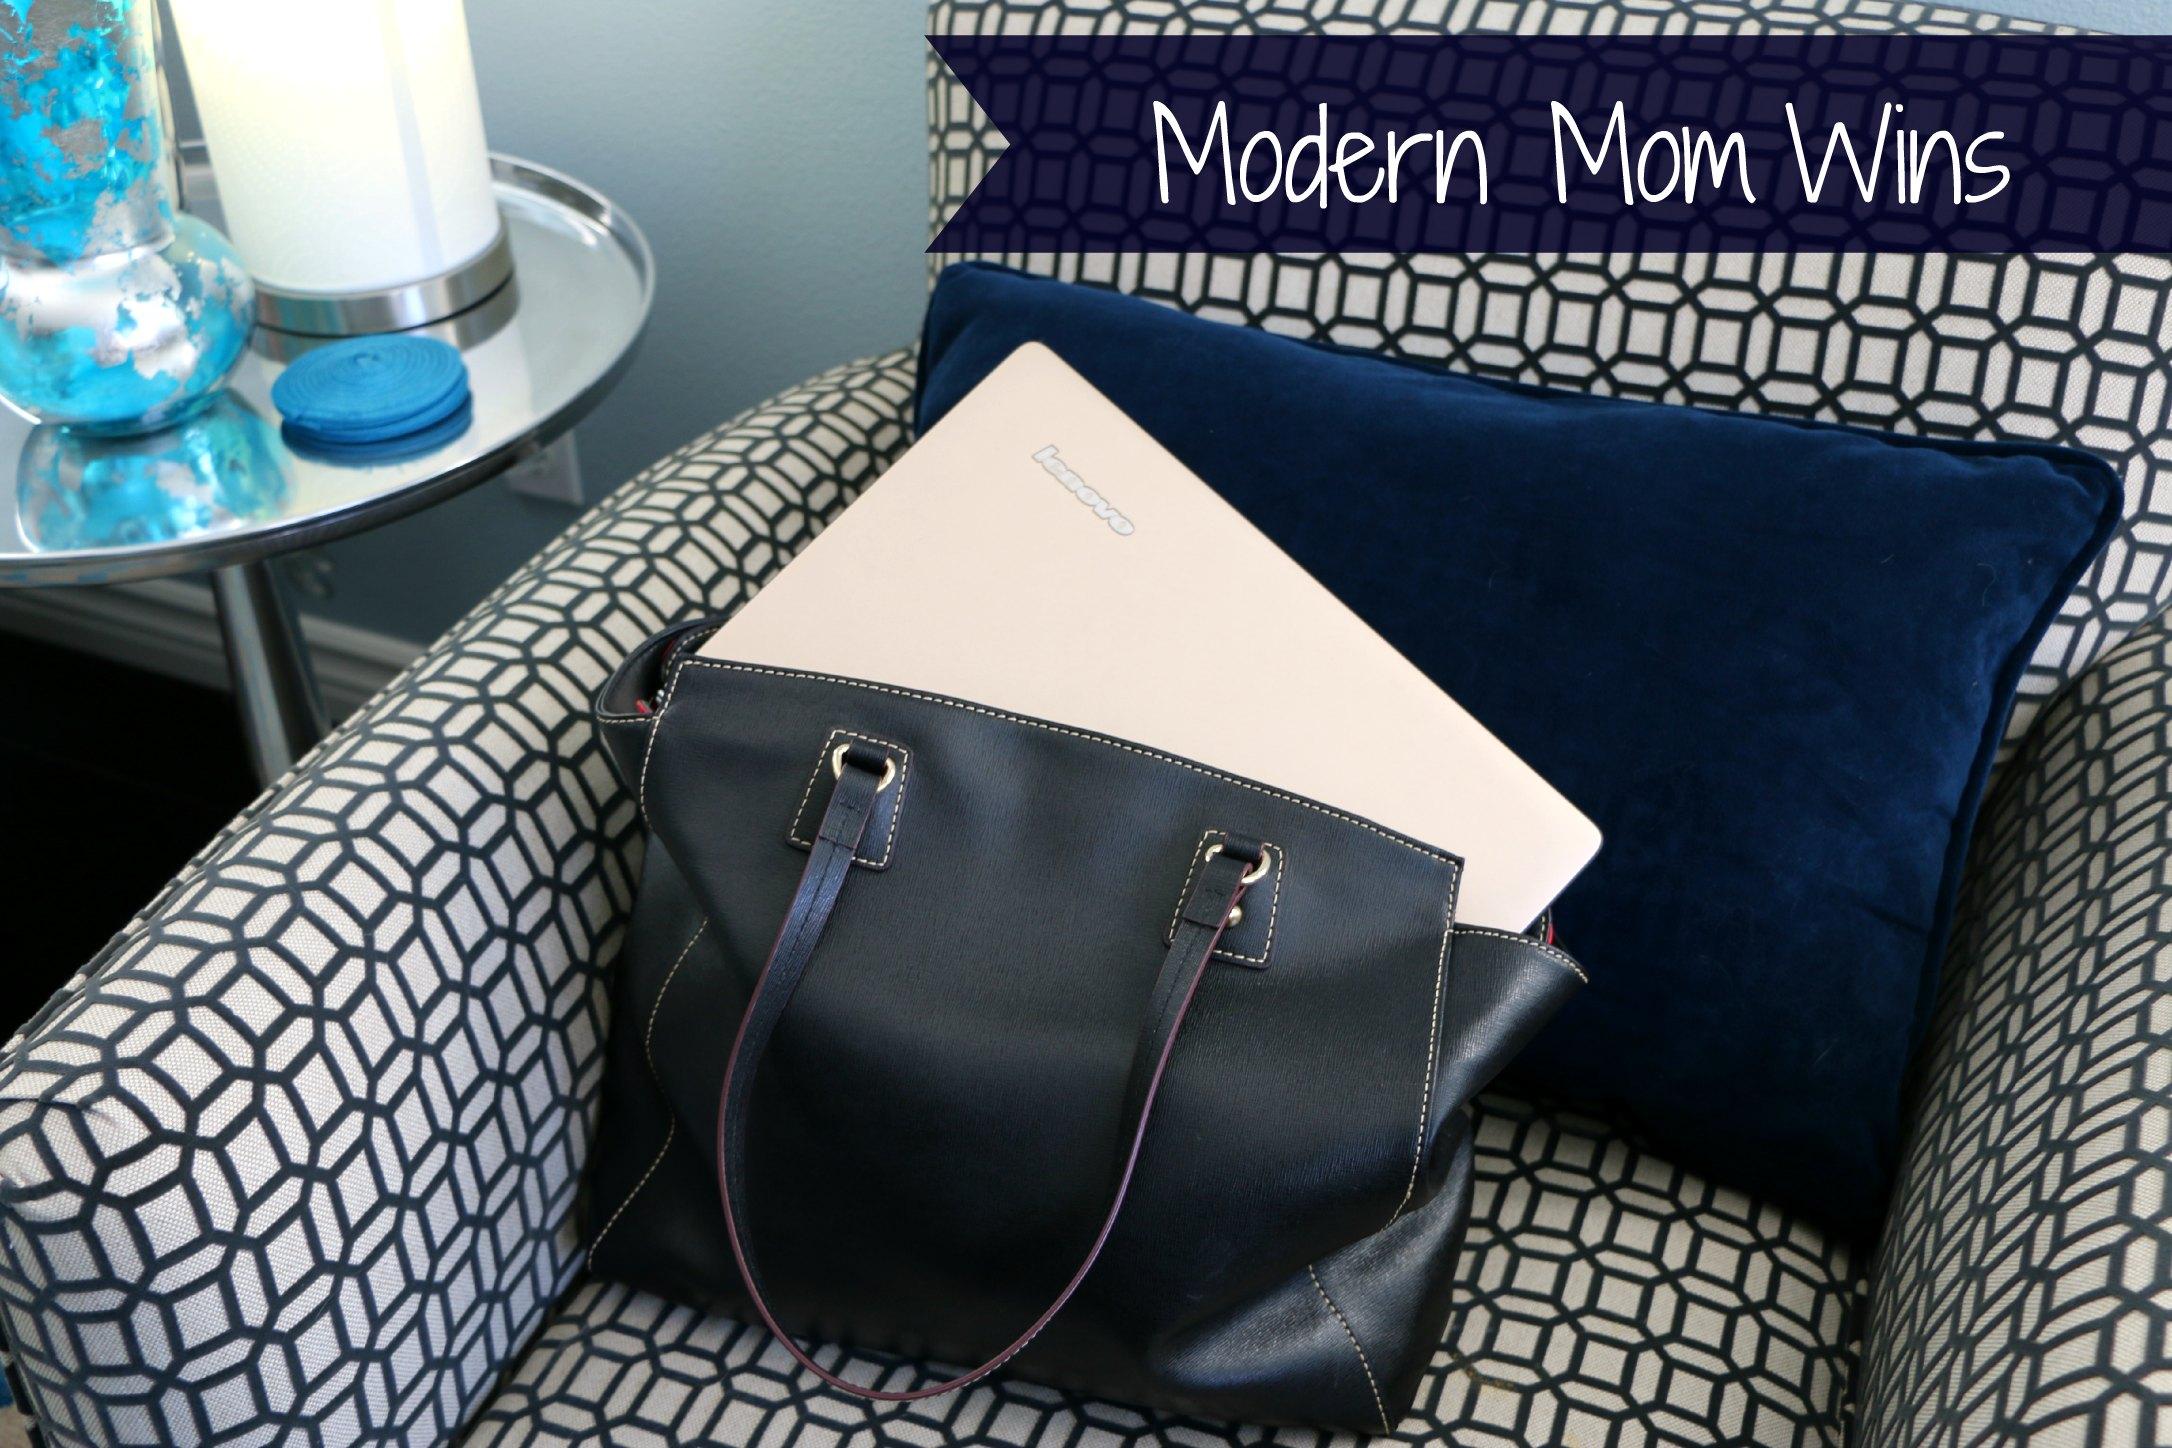 modern mom wins with lenovo